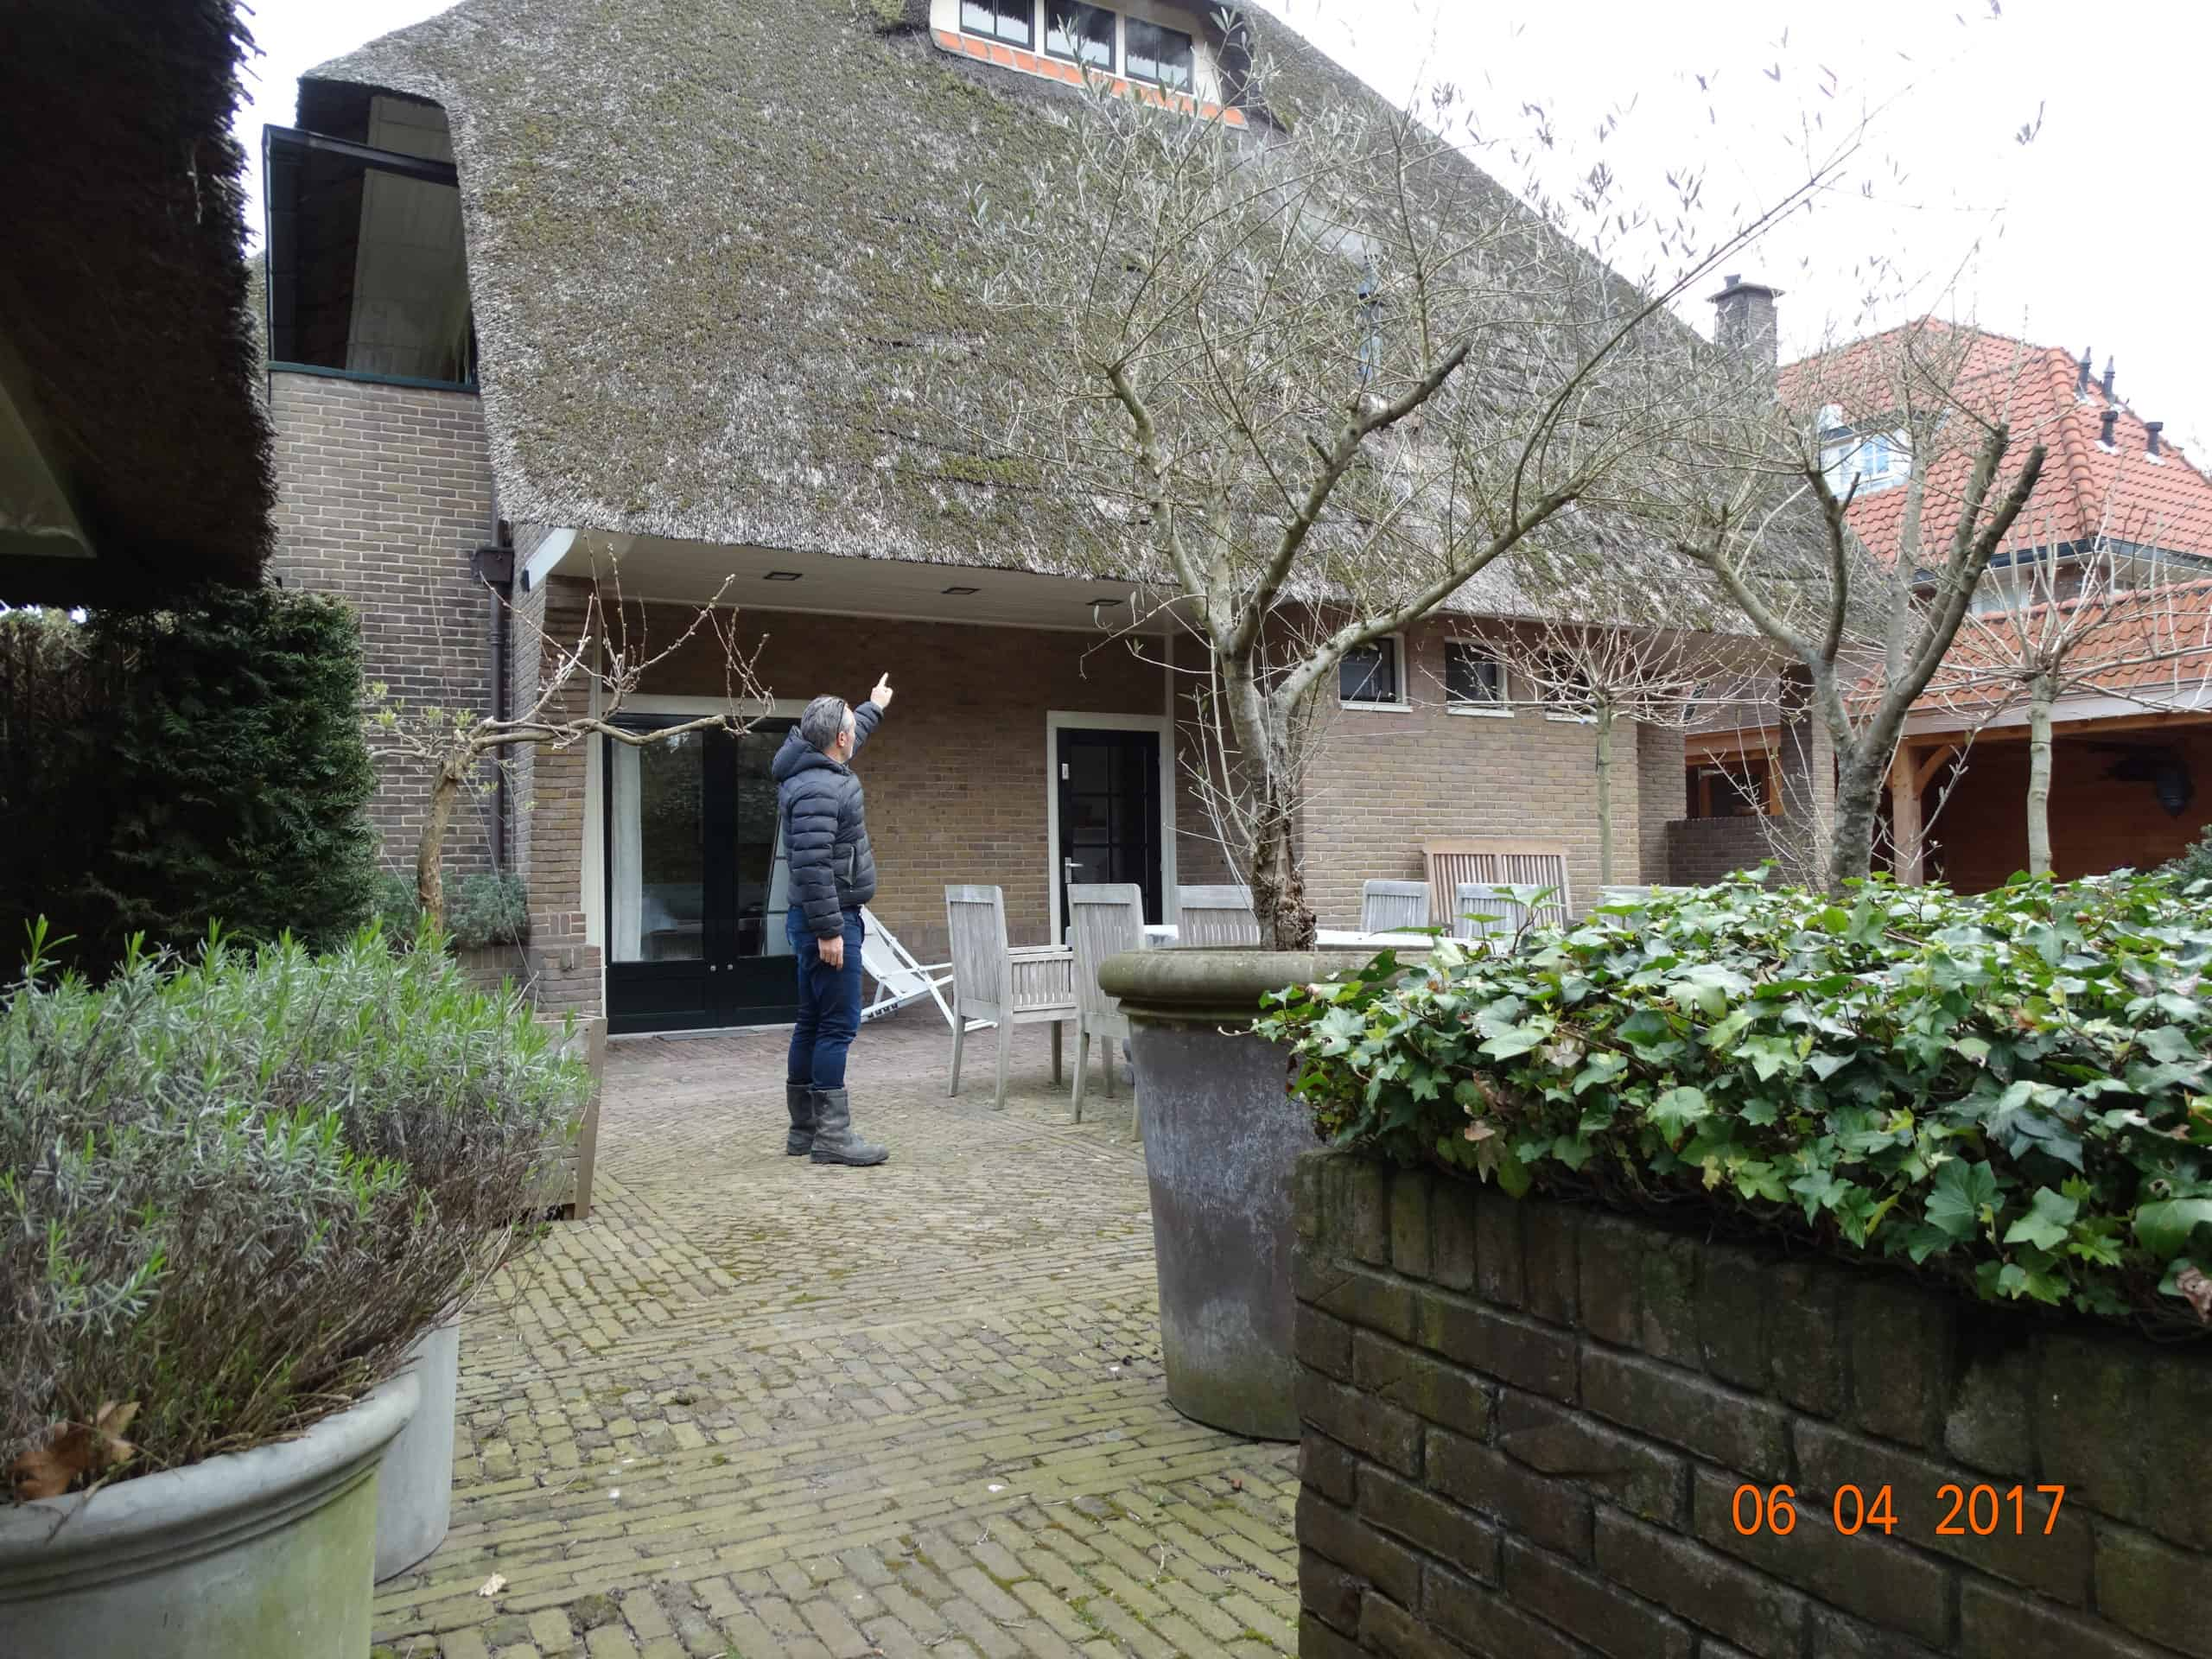 Bouwkundige keuring Hilversum (6)